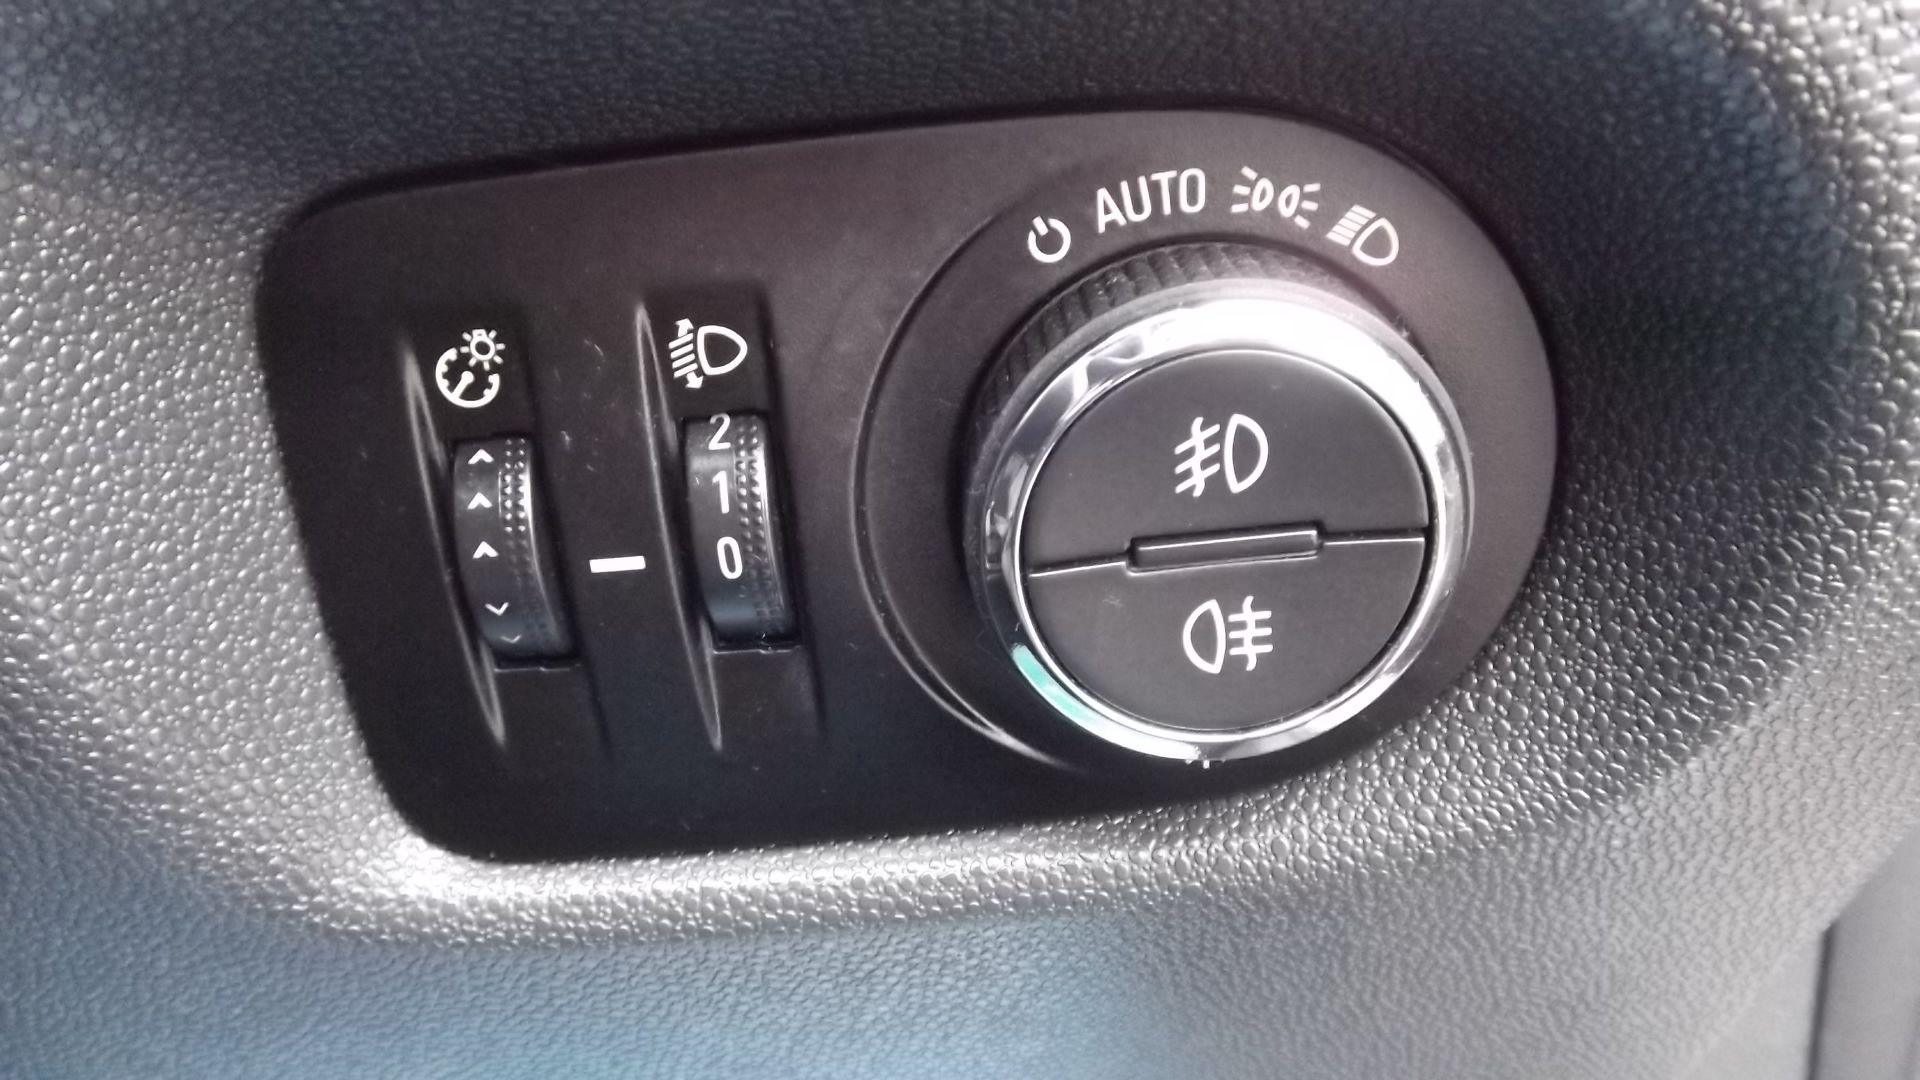 2014 Vauxhall Corsa Se 5Dr Hatchback - Full Service History - CL505 - NO VAT ON THE HAMMER - - Image 18 of 24